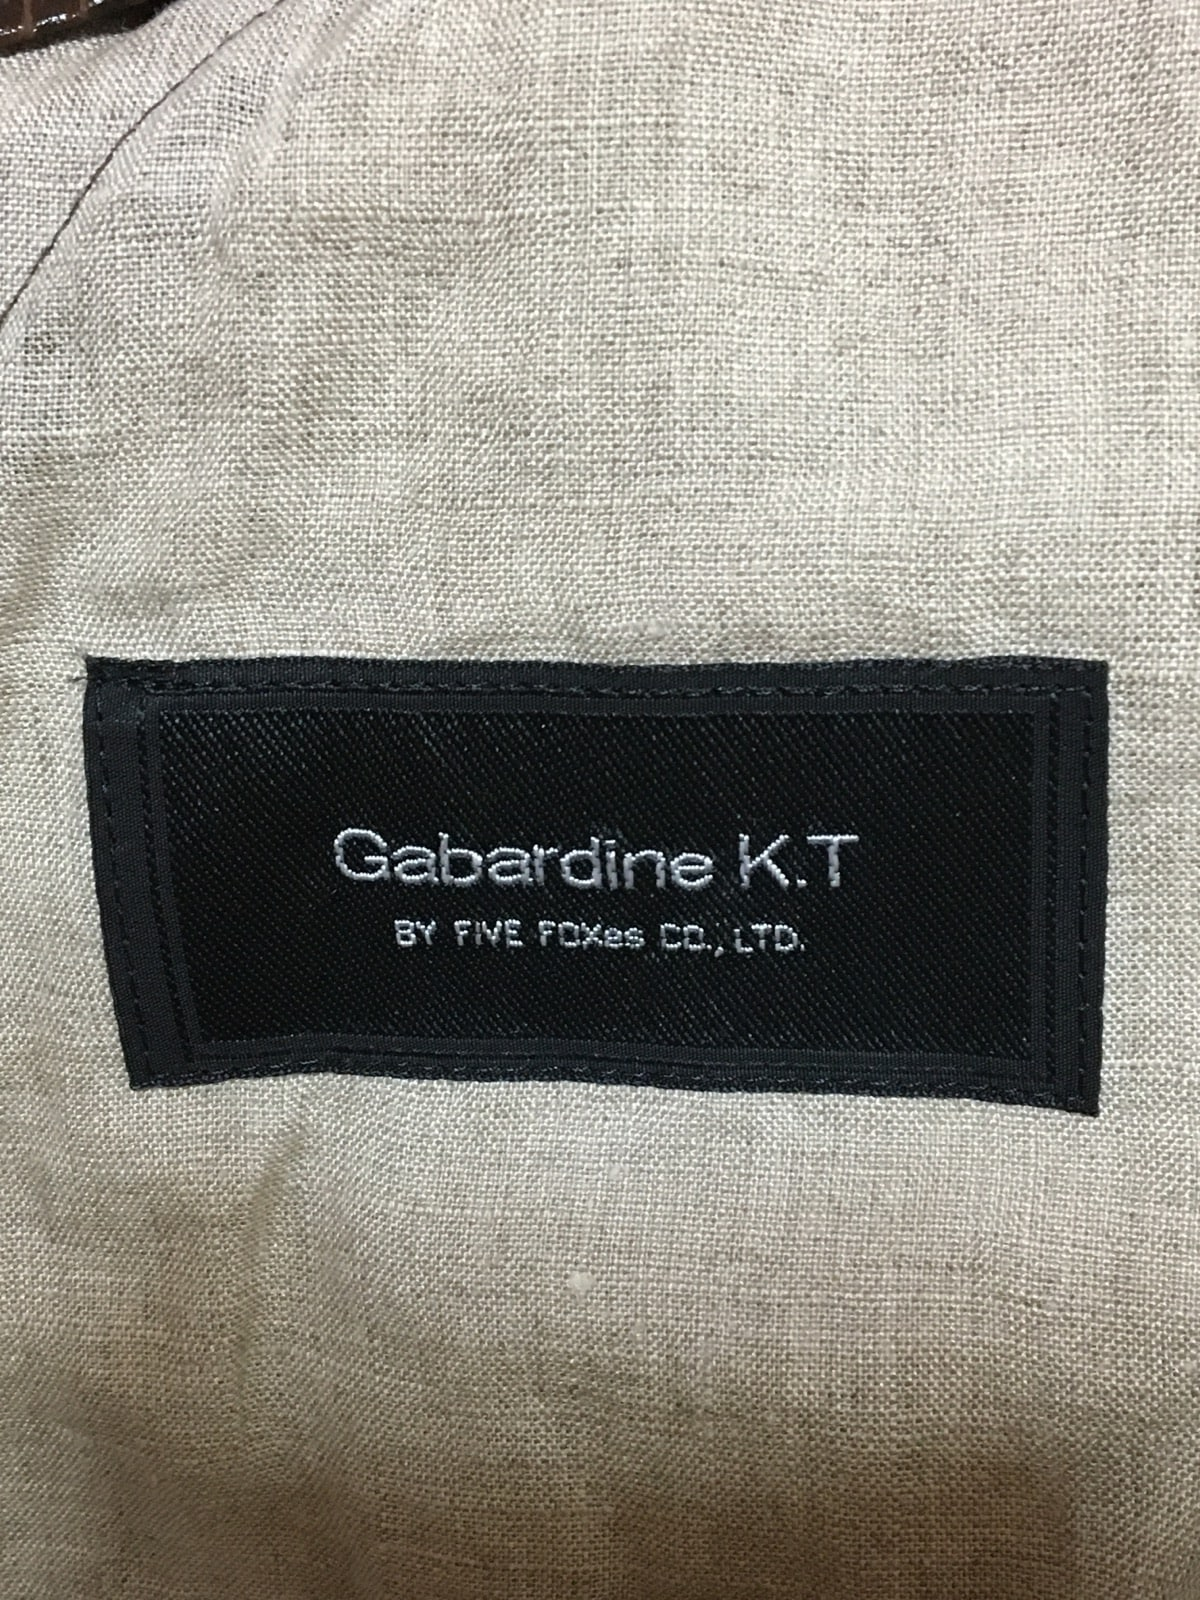 Gabardine K.T(ギャバジンケーティ)のコート